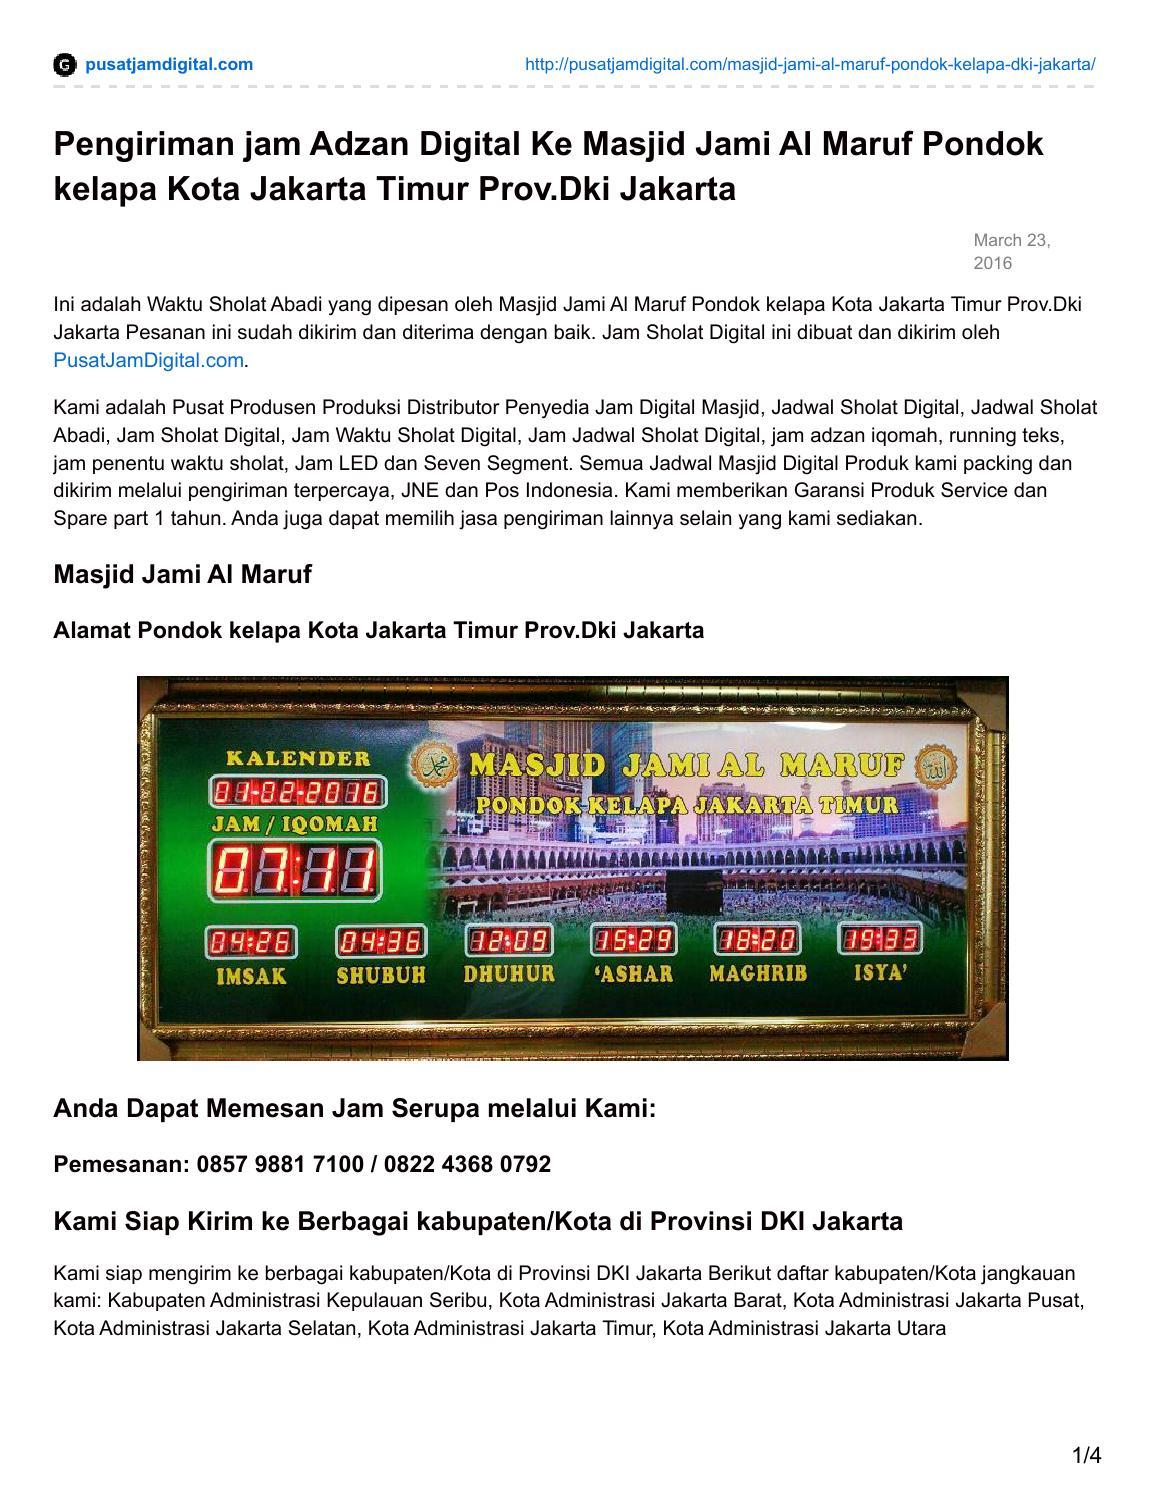 Pengiriman Jam Adzan Digital Masjid Jami Al Maruf Pondok Kelapa